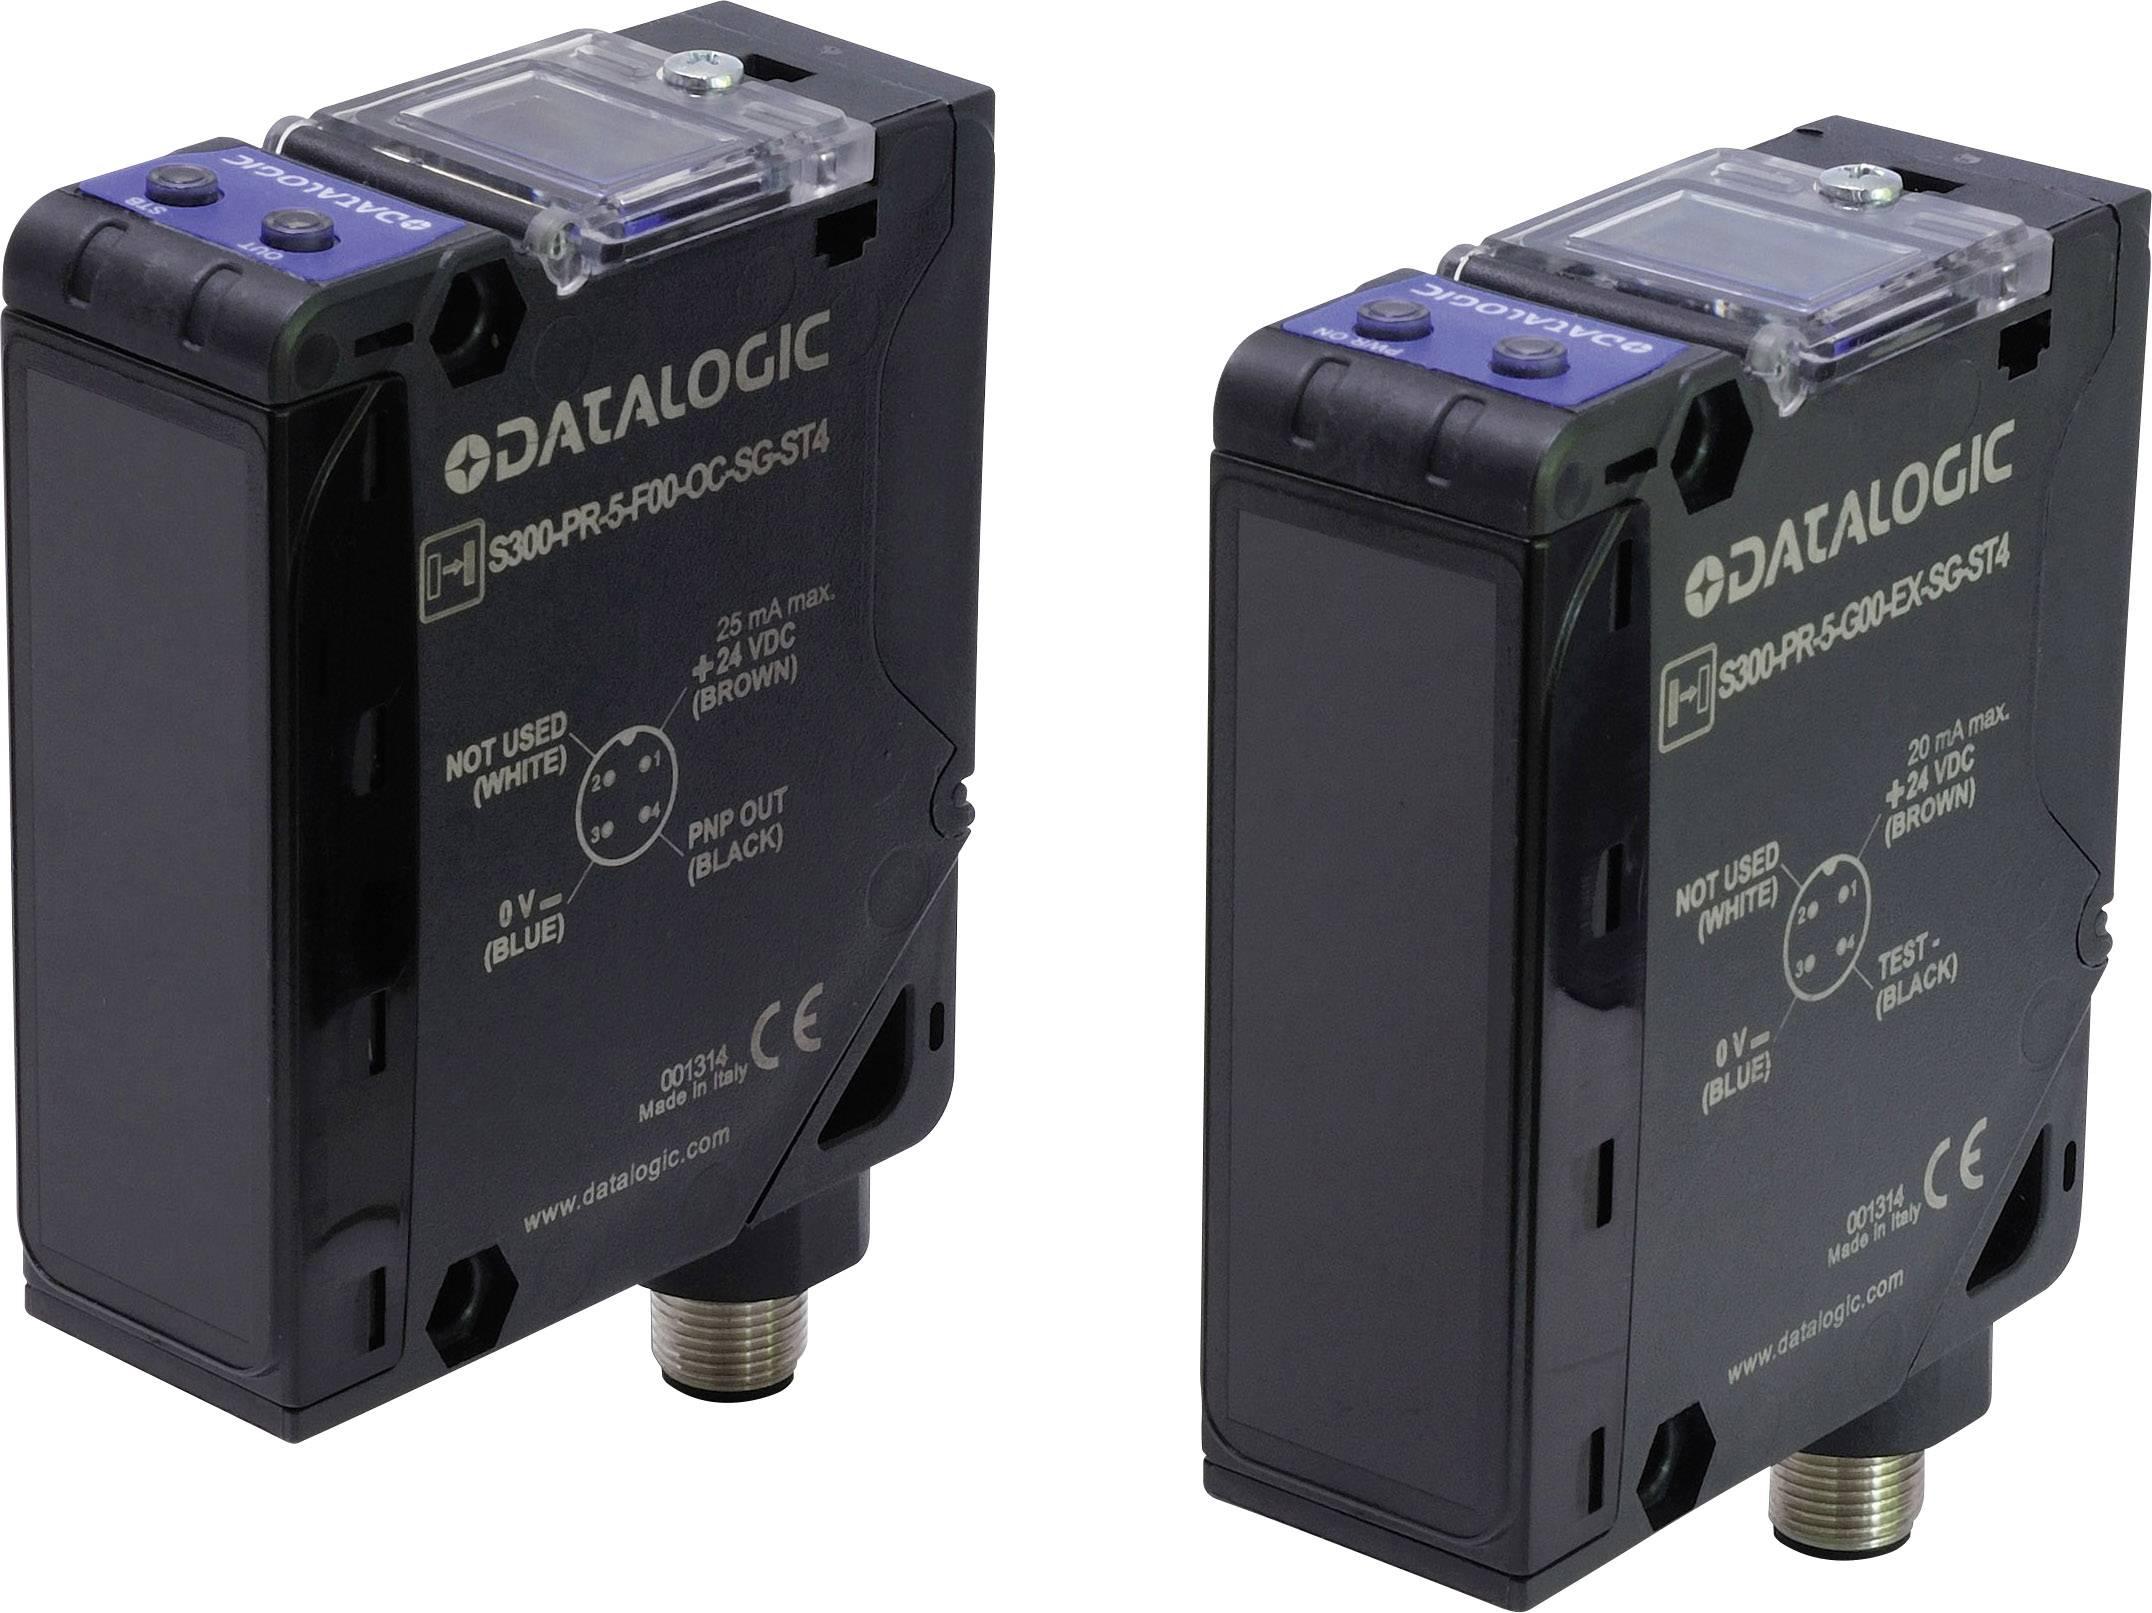 Reflexná svetelná závora DataLogic S300-PR-1-B01-RX 951451040, Max. dosah 22 m